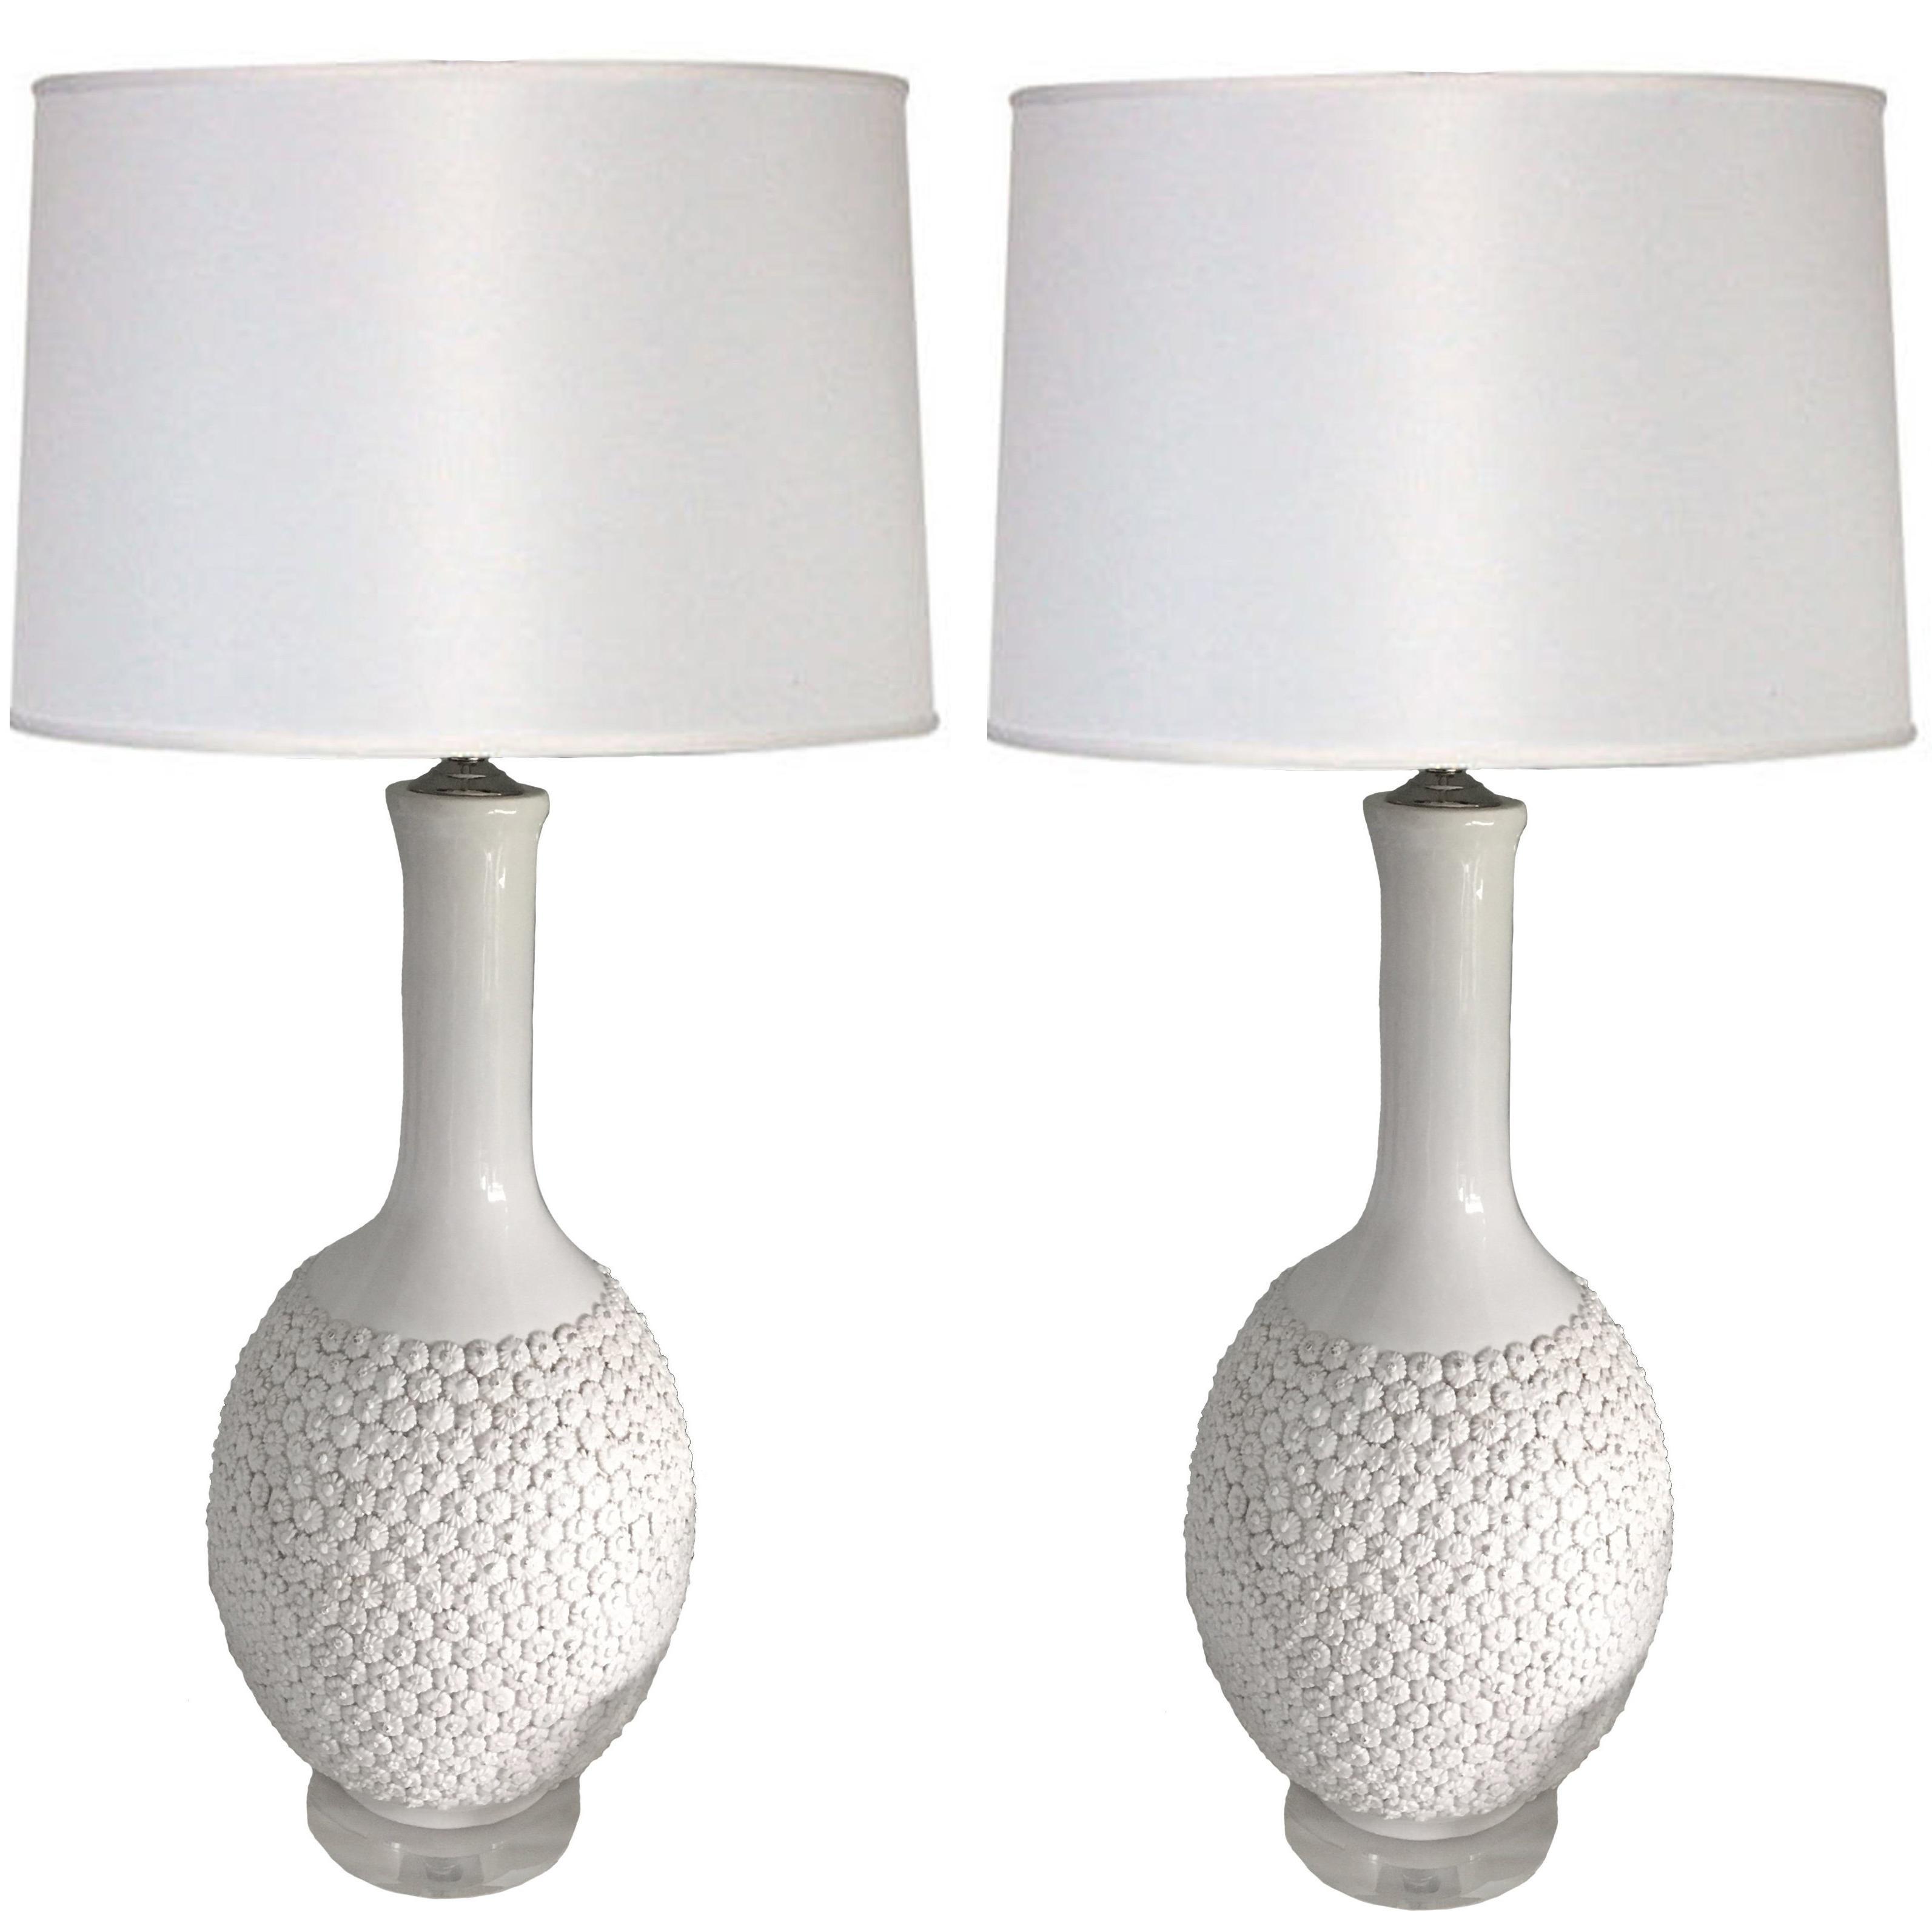 Pair of Marbro Blanc de Chien Flower Lamps